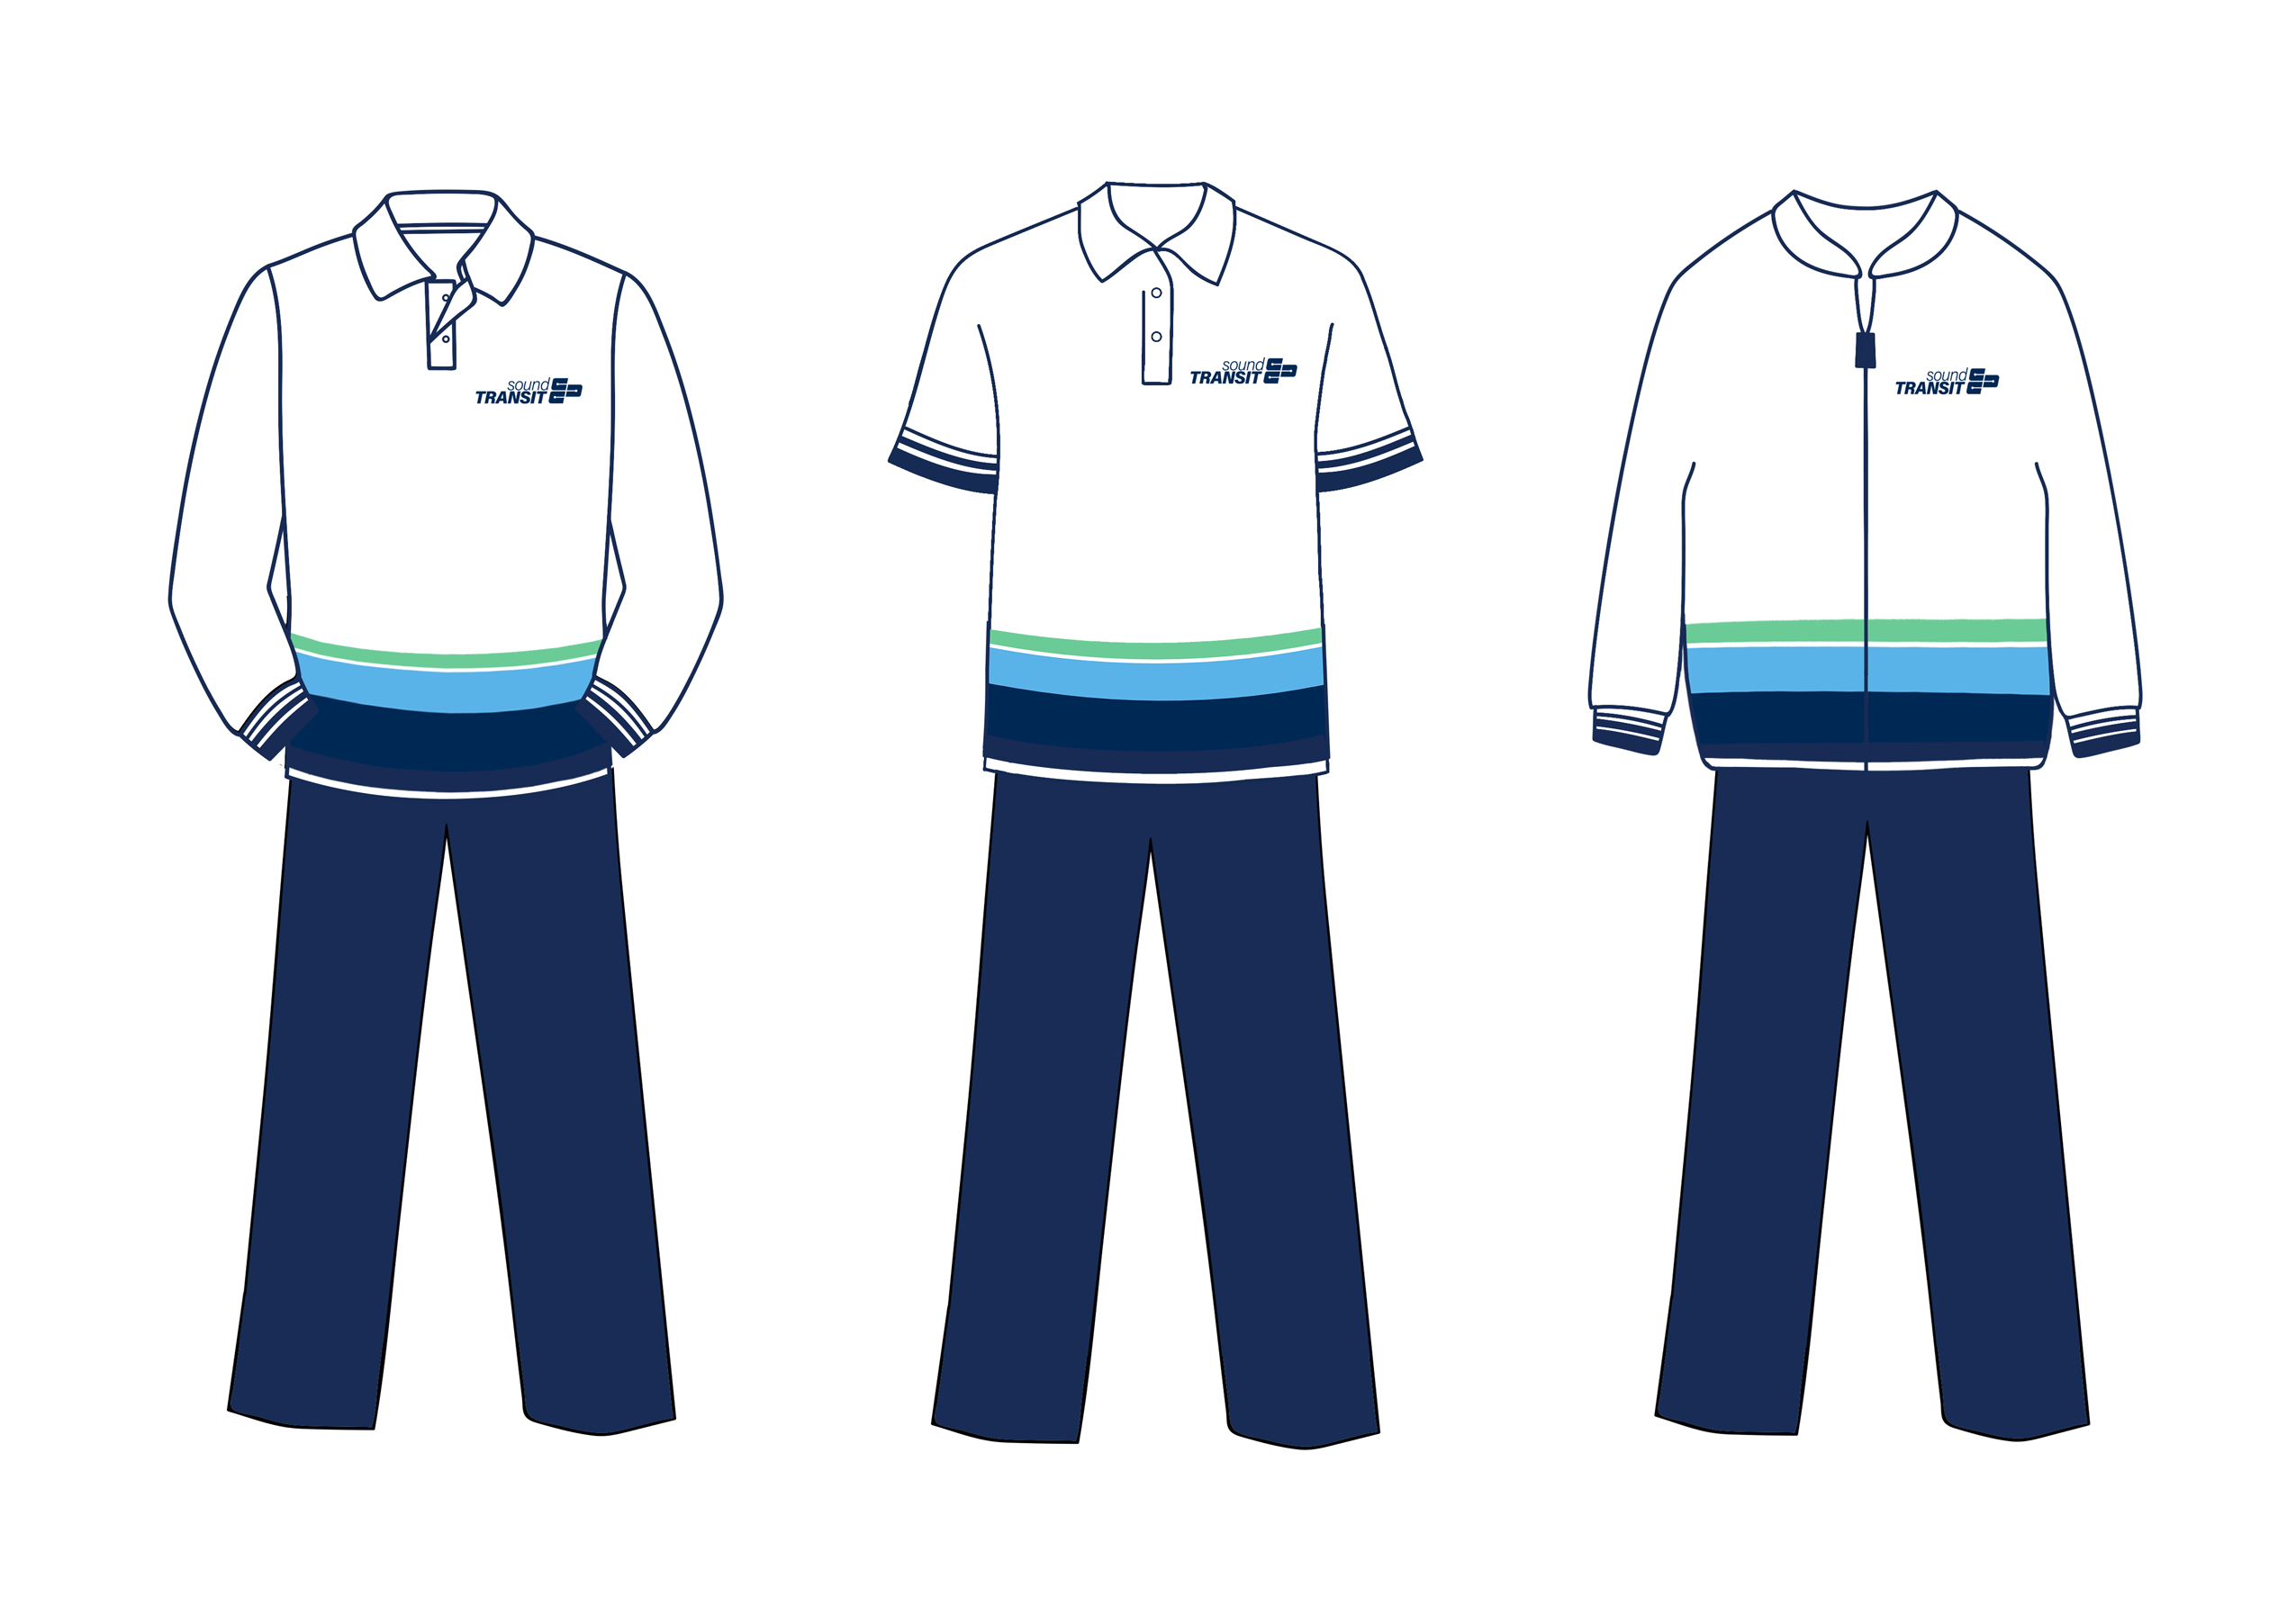 uniform-sets